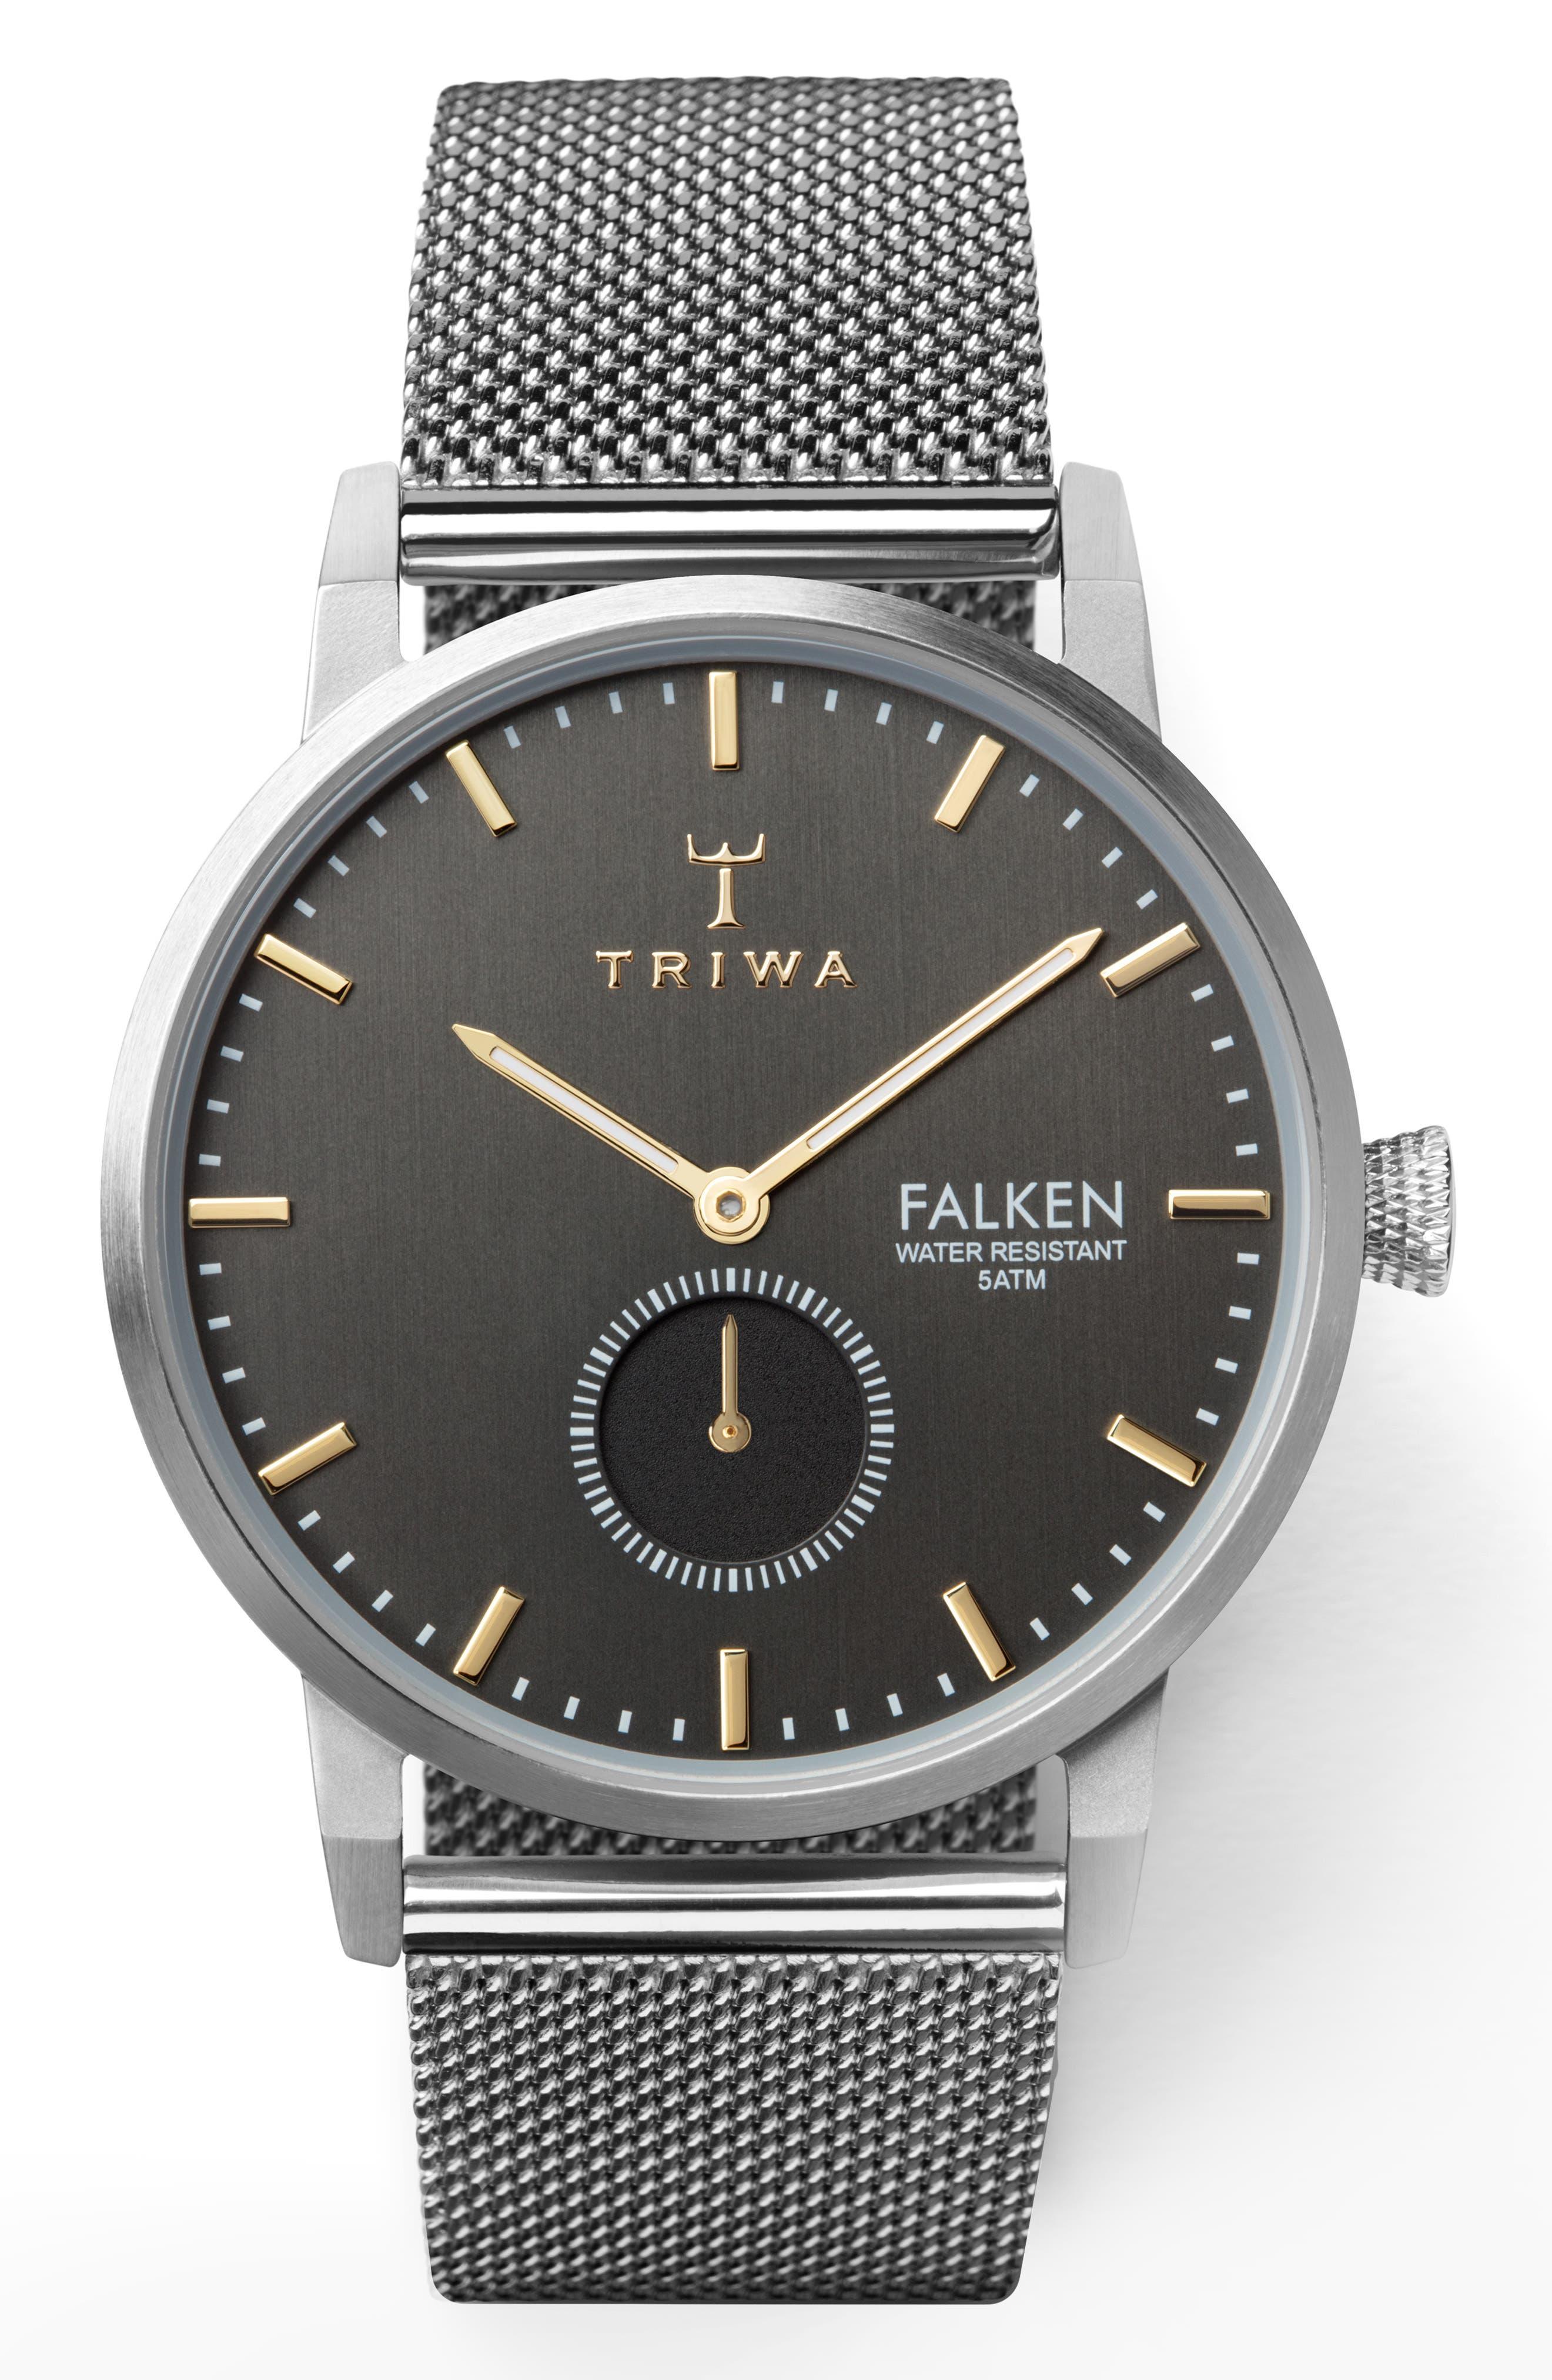 TRIWA Smoky Falken Mesh Strap Watch, 38Mm in Silver/ Grey/ Silver